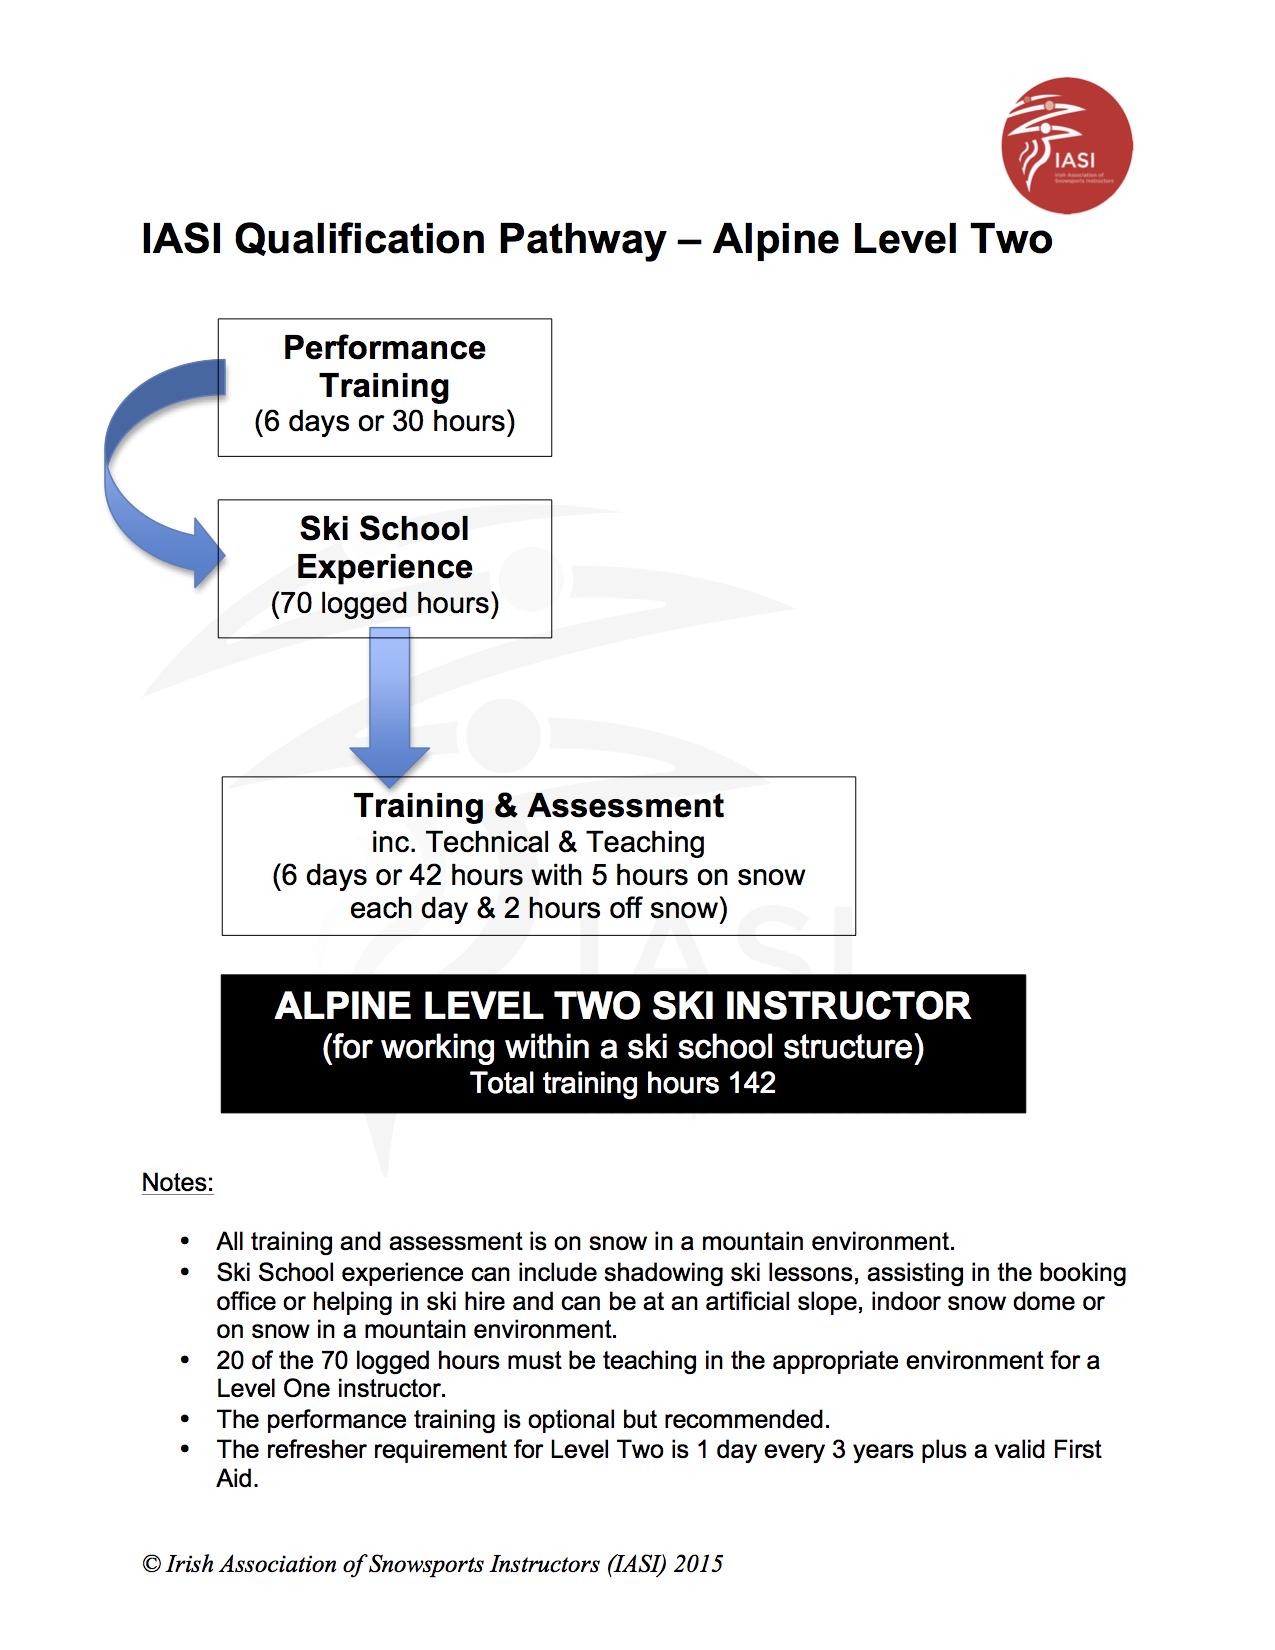 IASI Qualification Pathway Alpine Level 2